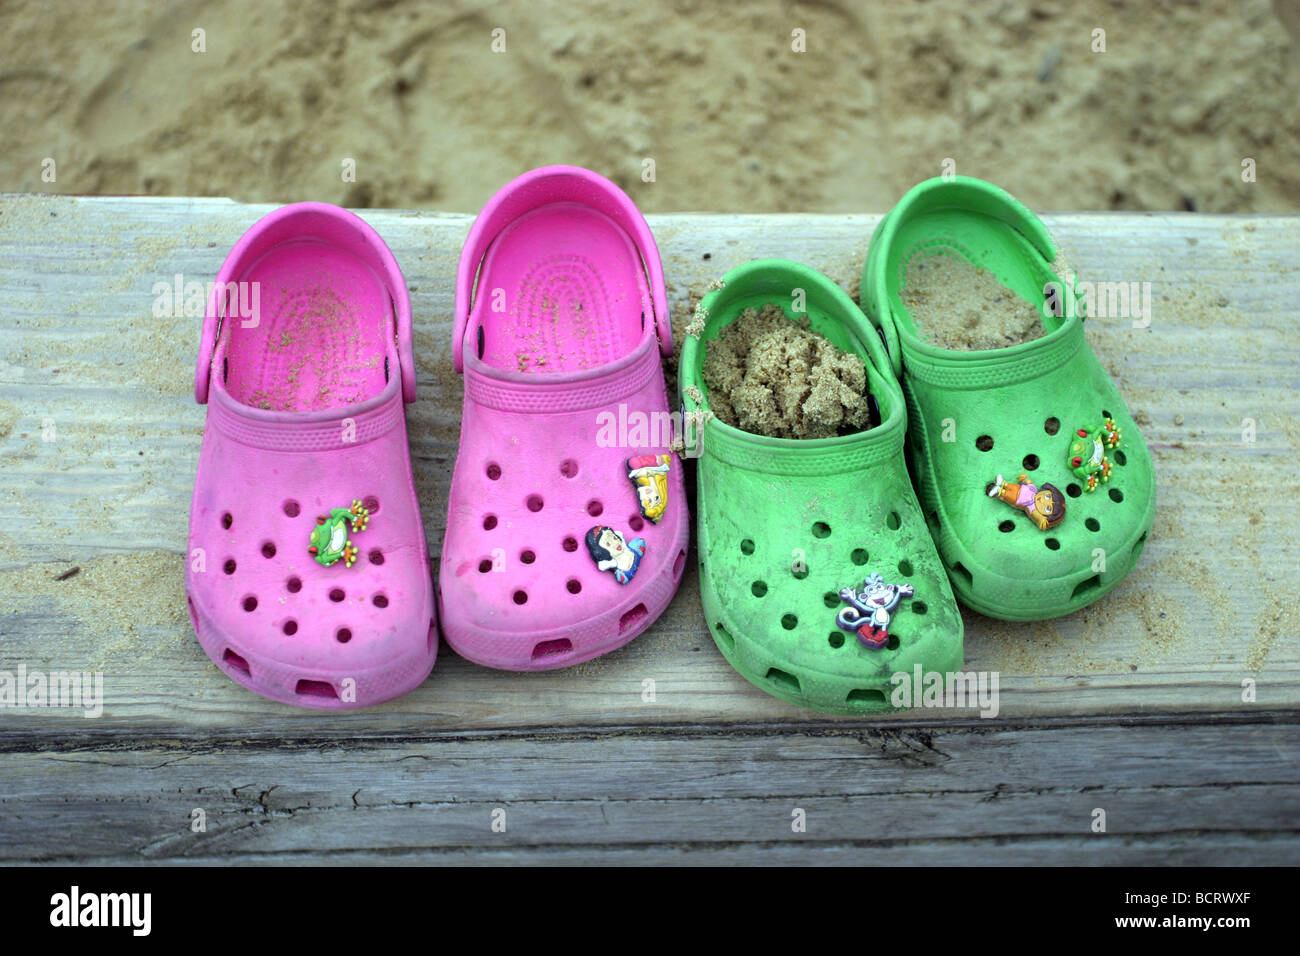 9dc97e3d9 Childrens Crocs Stock Photos   Childrens Crocs Stock Images - Alamy